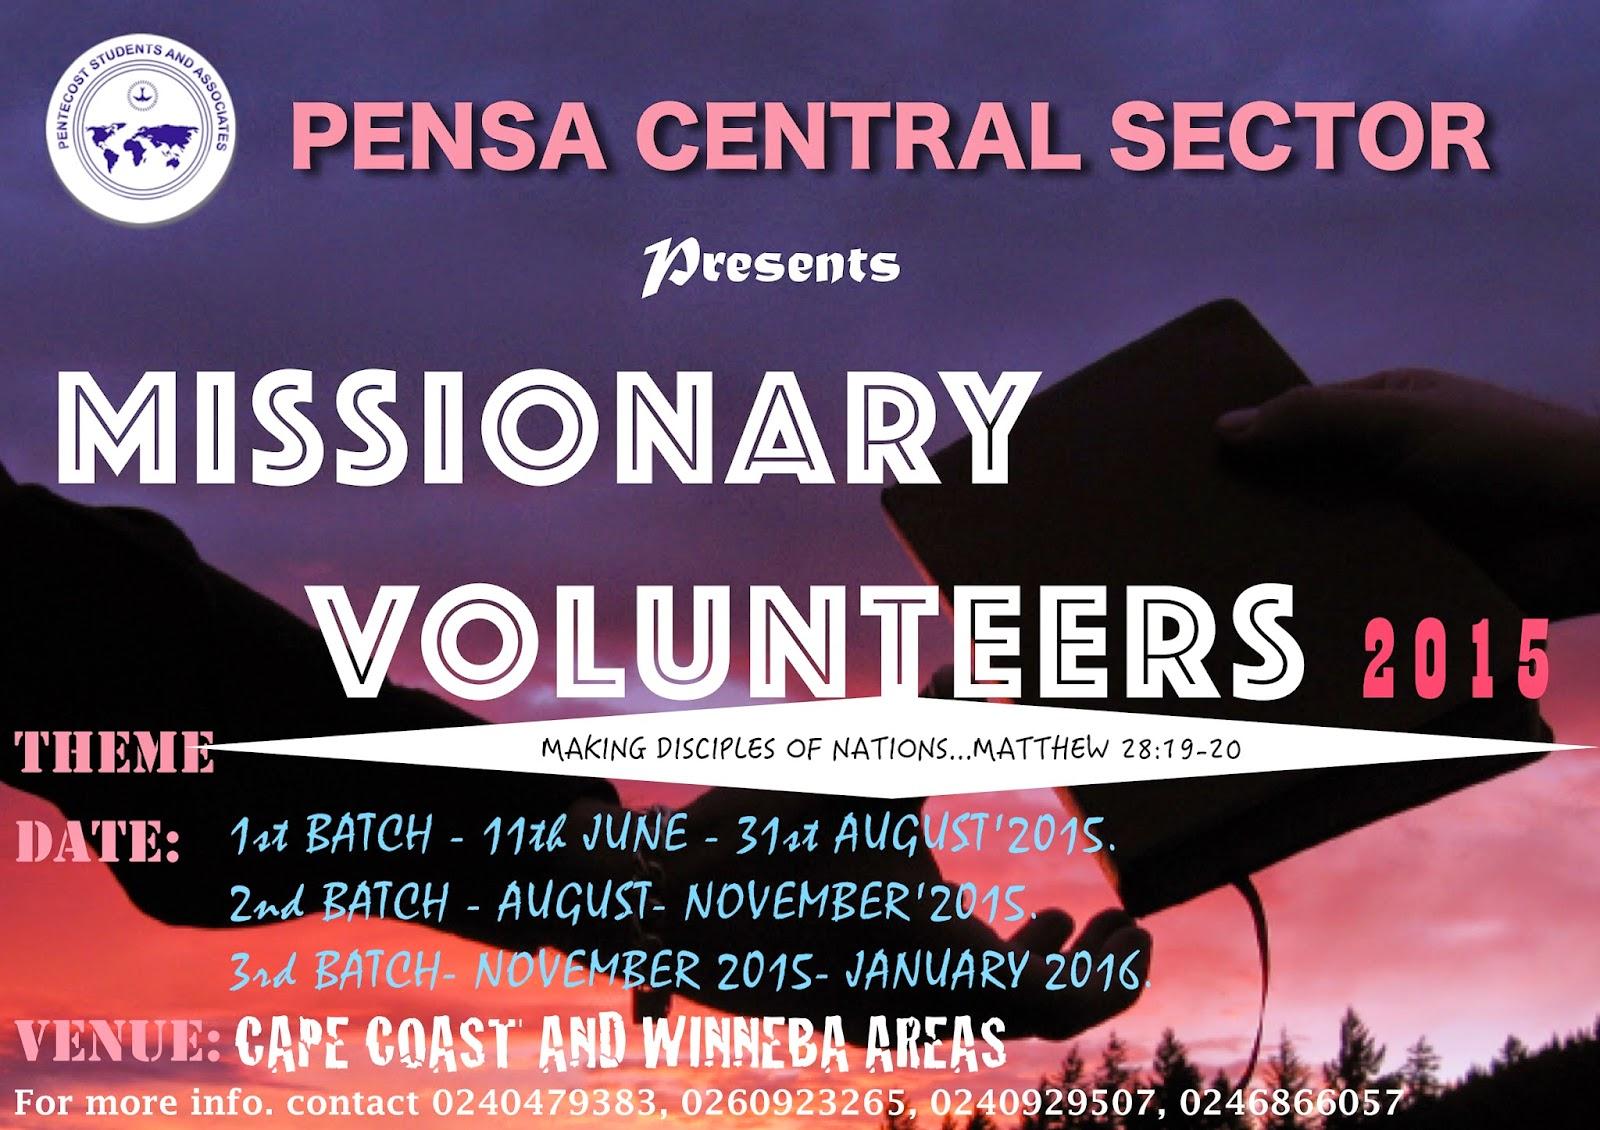 Chnts winneba array missionary volunteers rh pensacentral blogspot fandeluxe Images